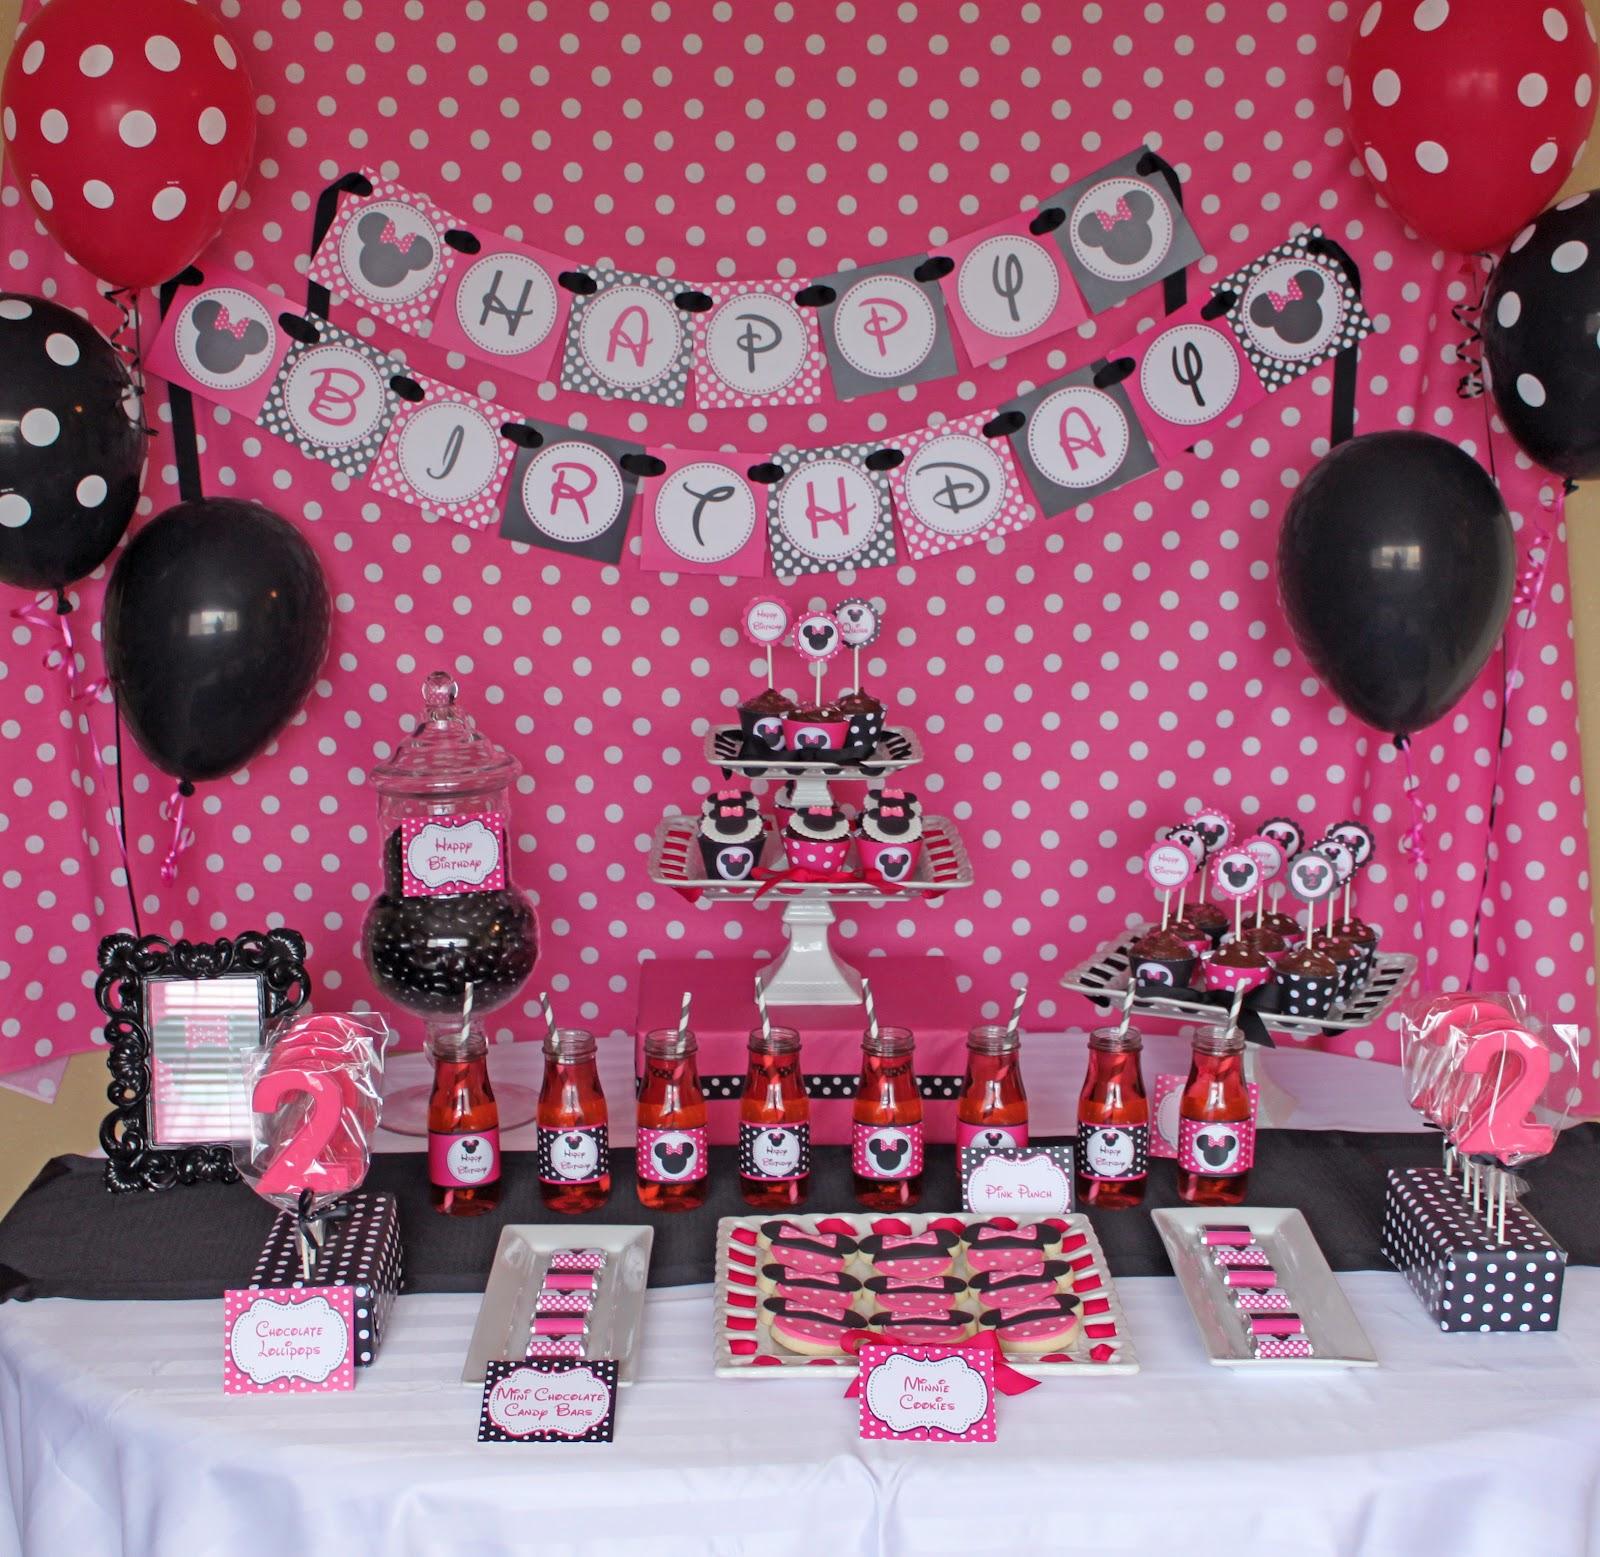 Minnie Mouse Party Decorations Favors Ideas